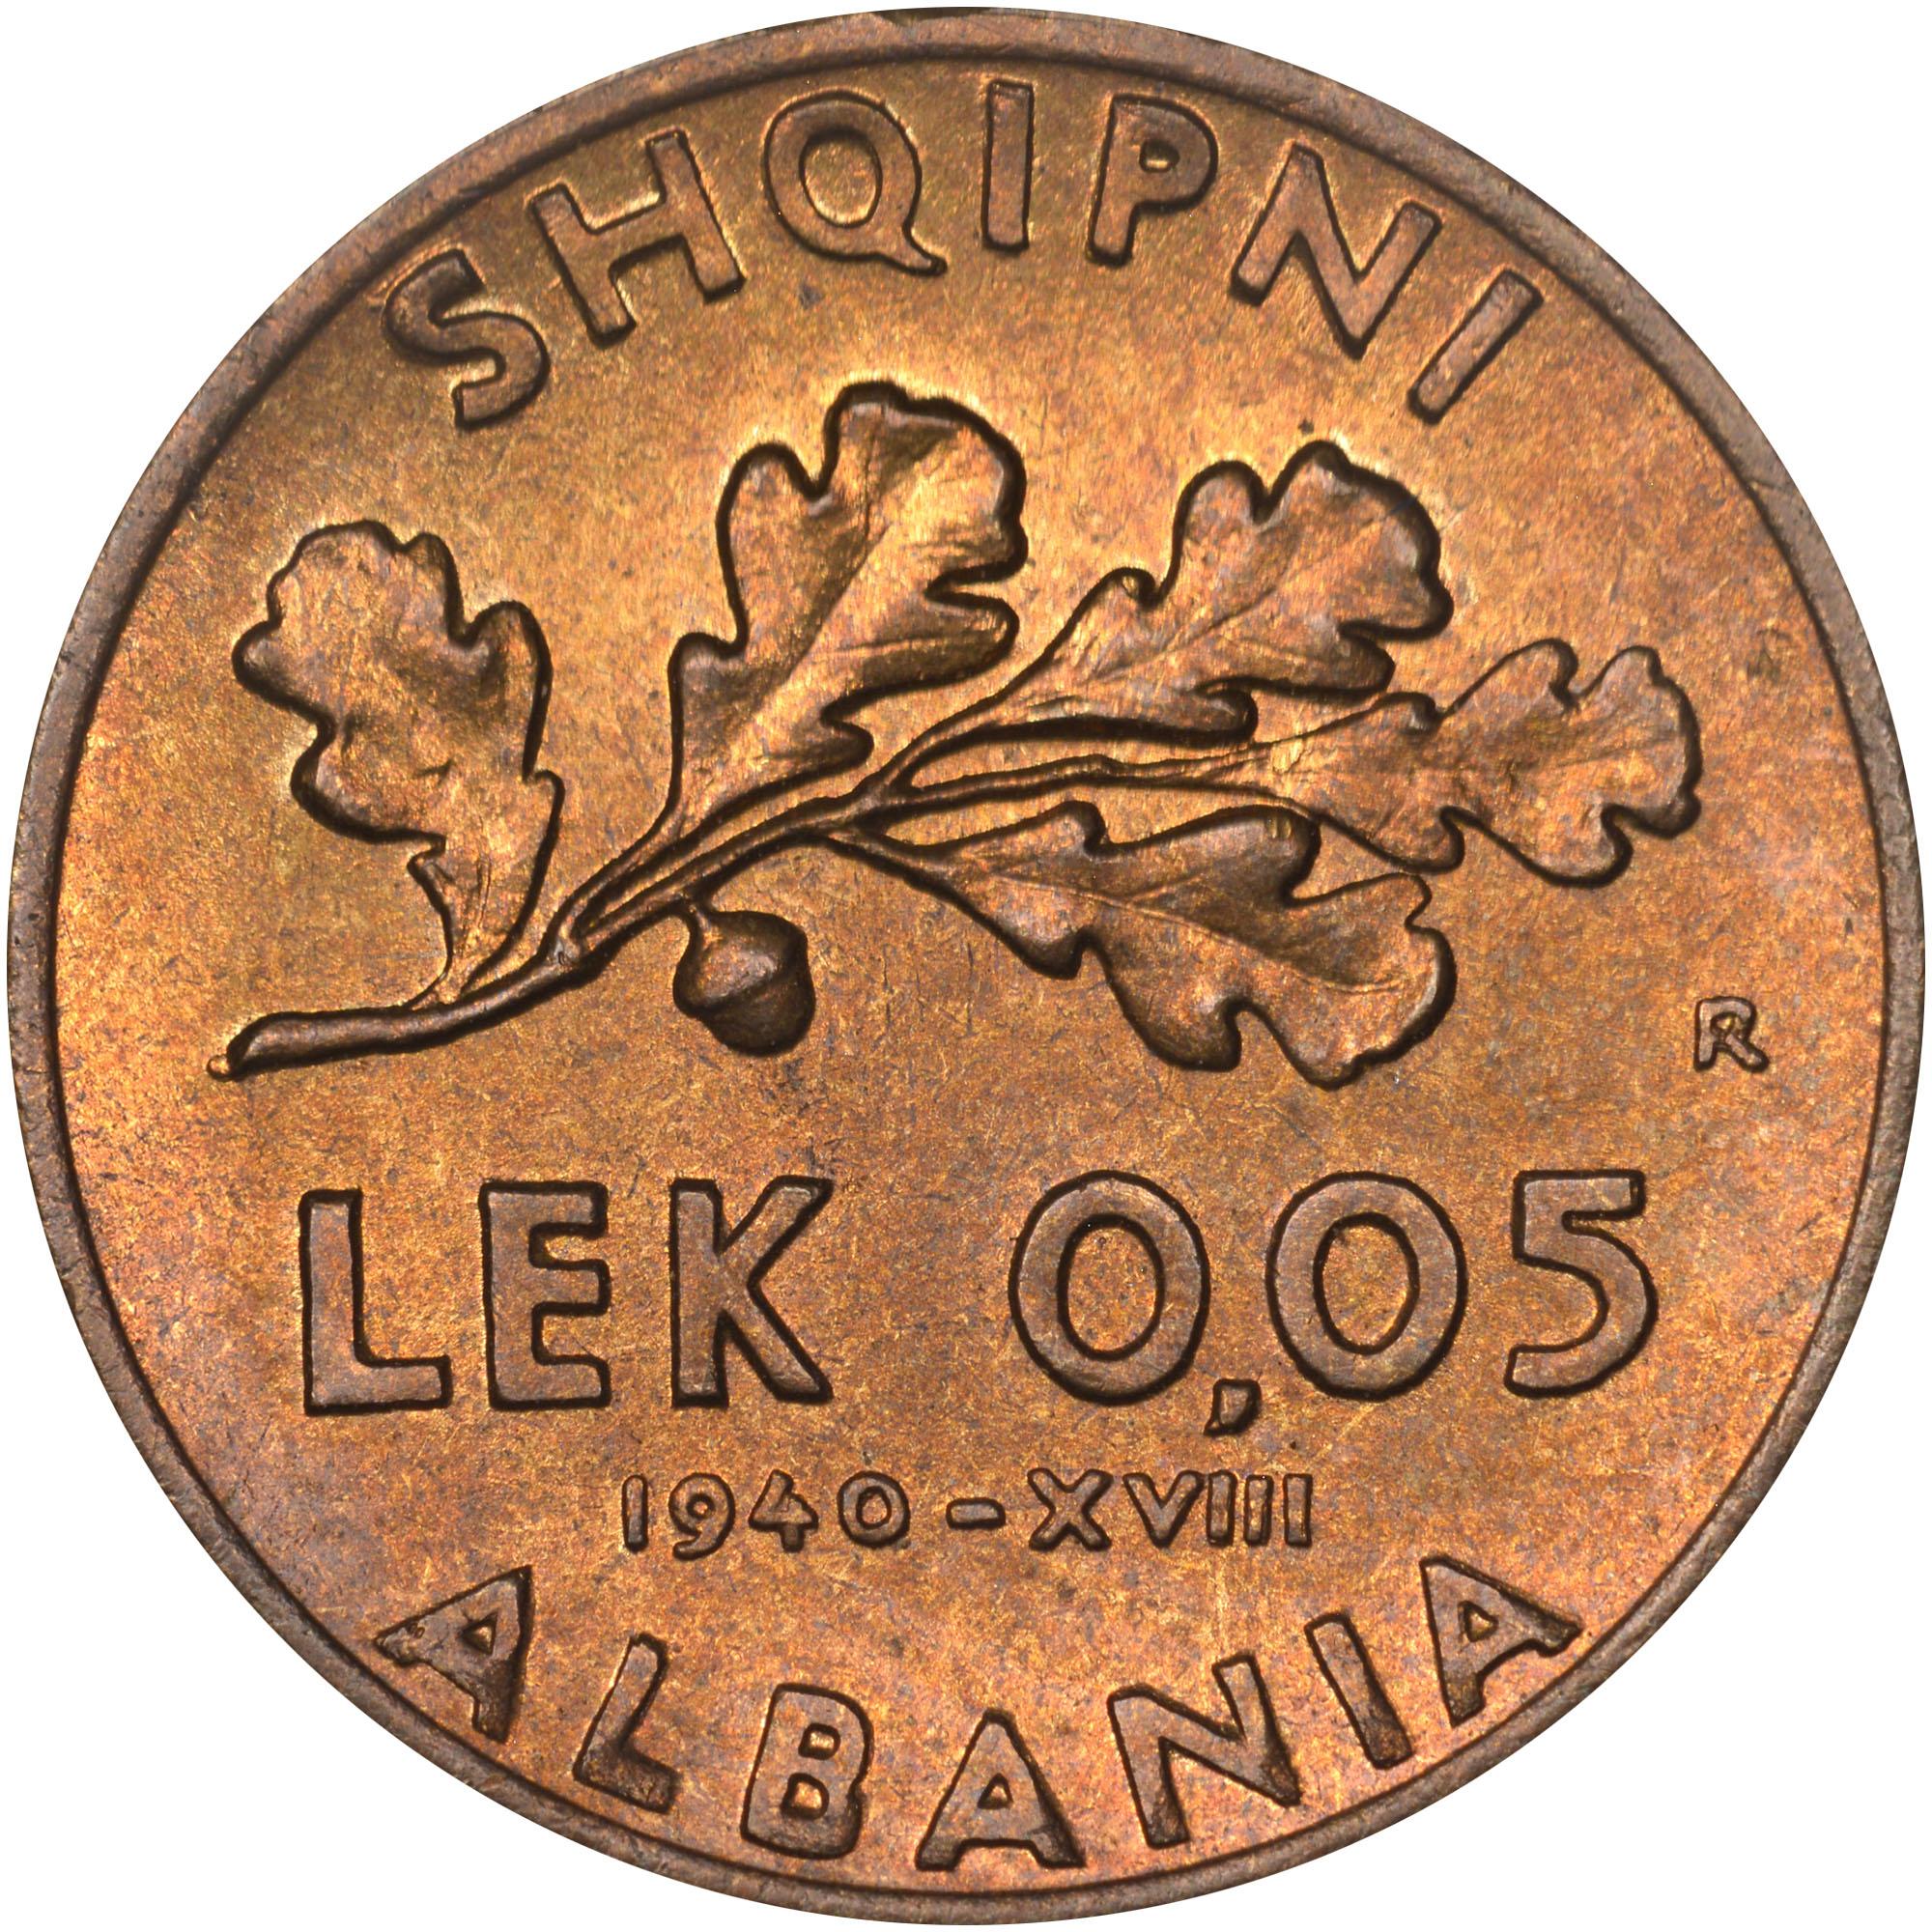 1940-1941 Albania 0.05 Lek reverse